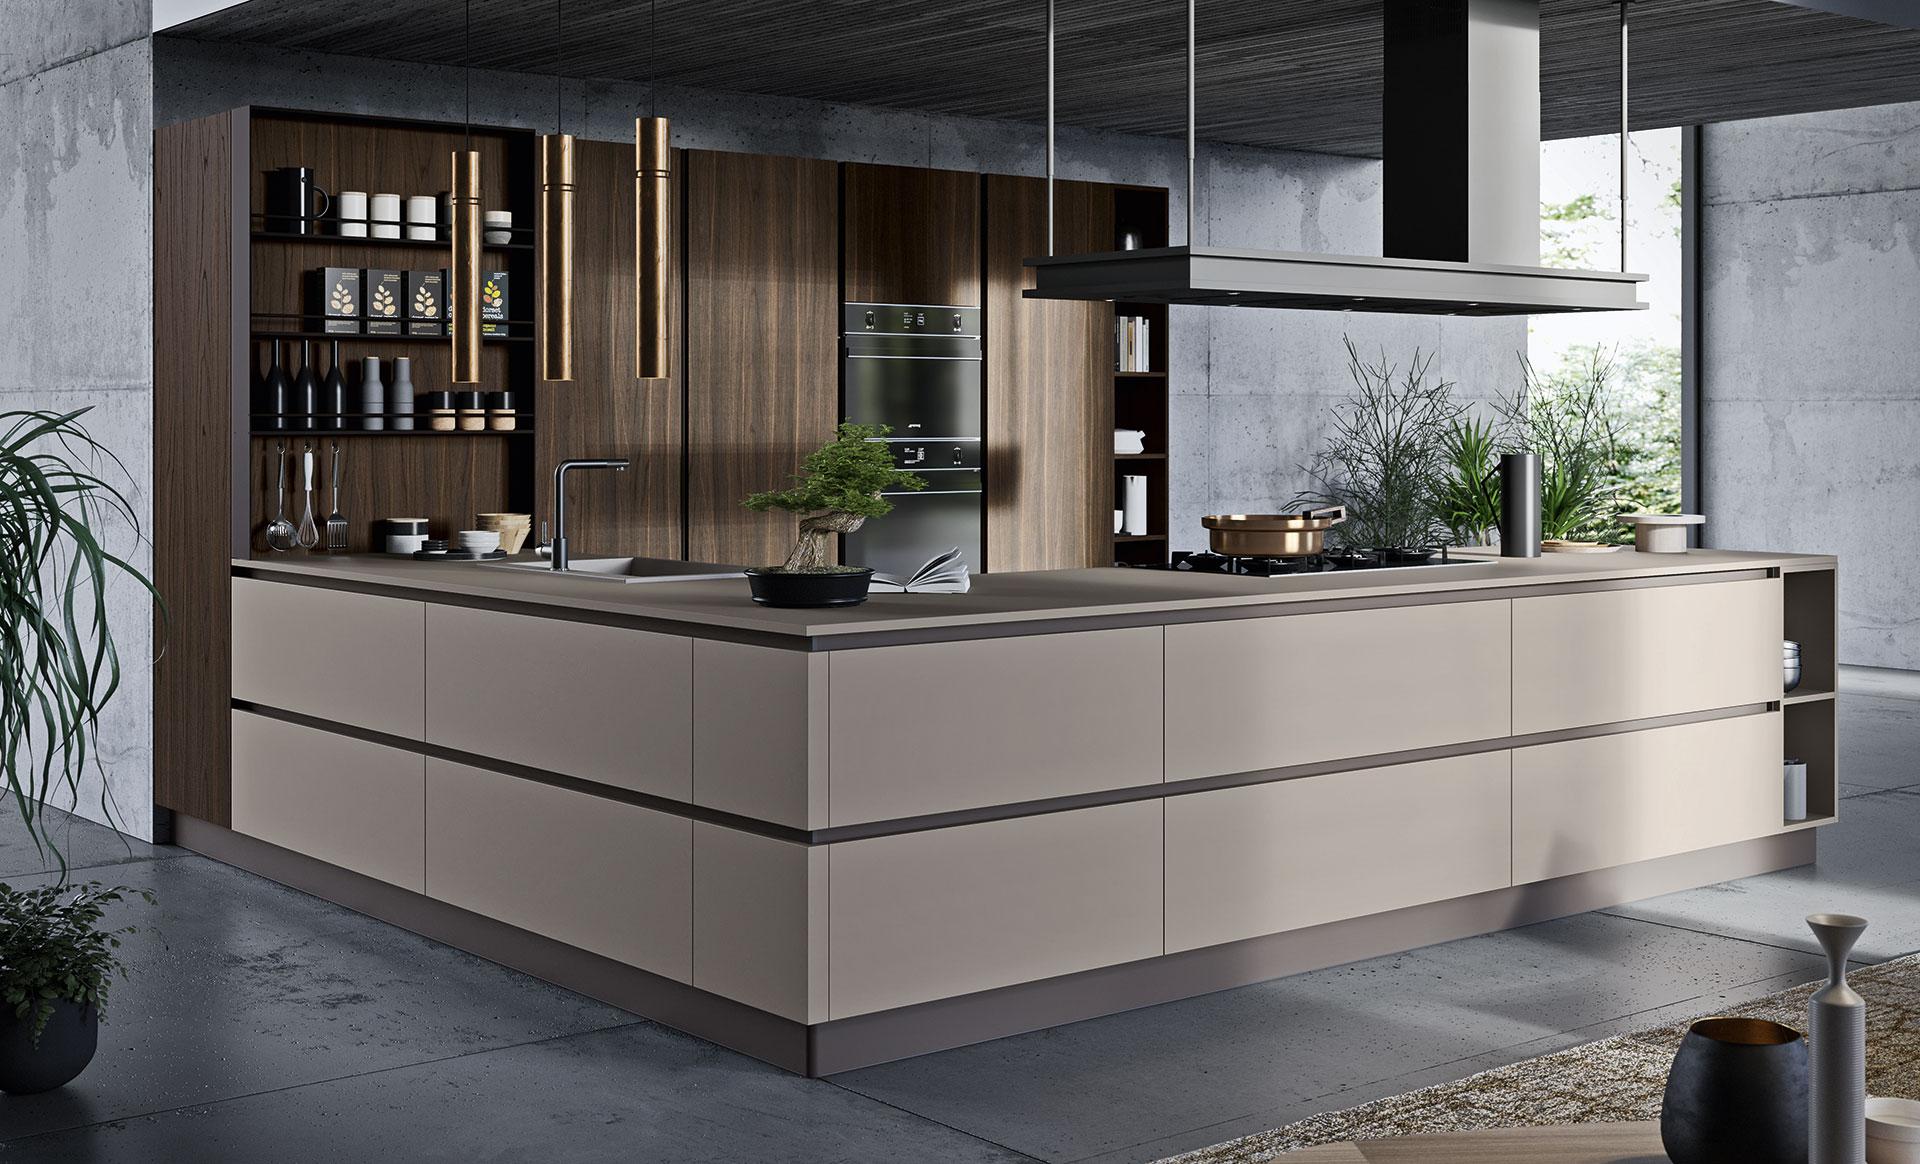 Un design originale per le cucine moderne   Antares